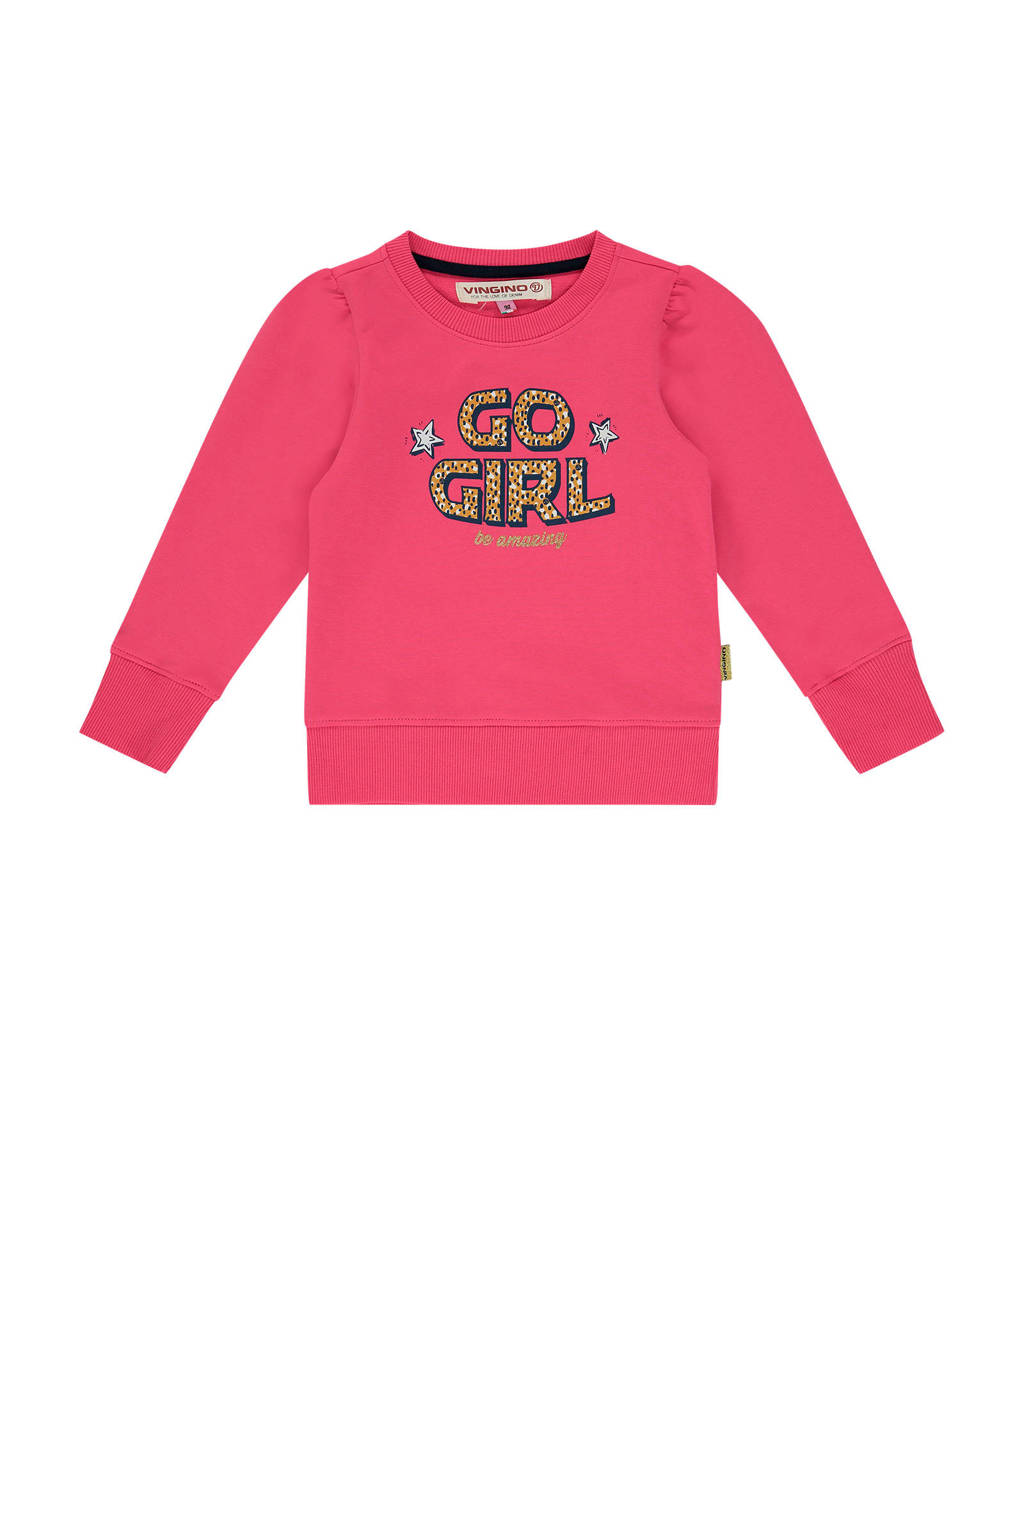 Vingino sweater Niska mini met tekst felroze, Felroze